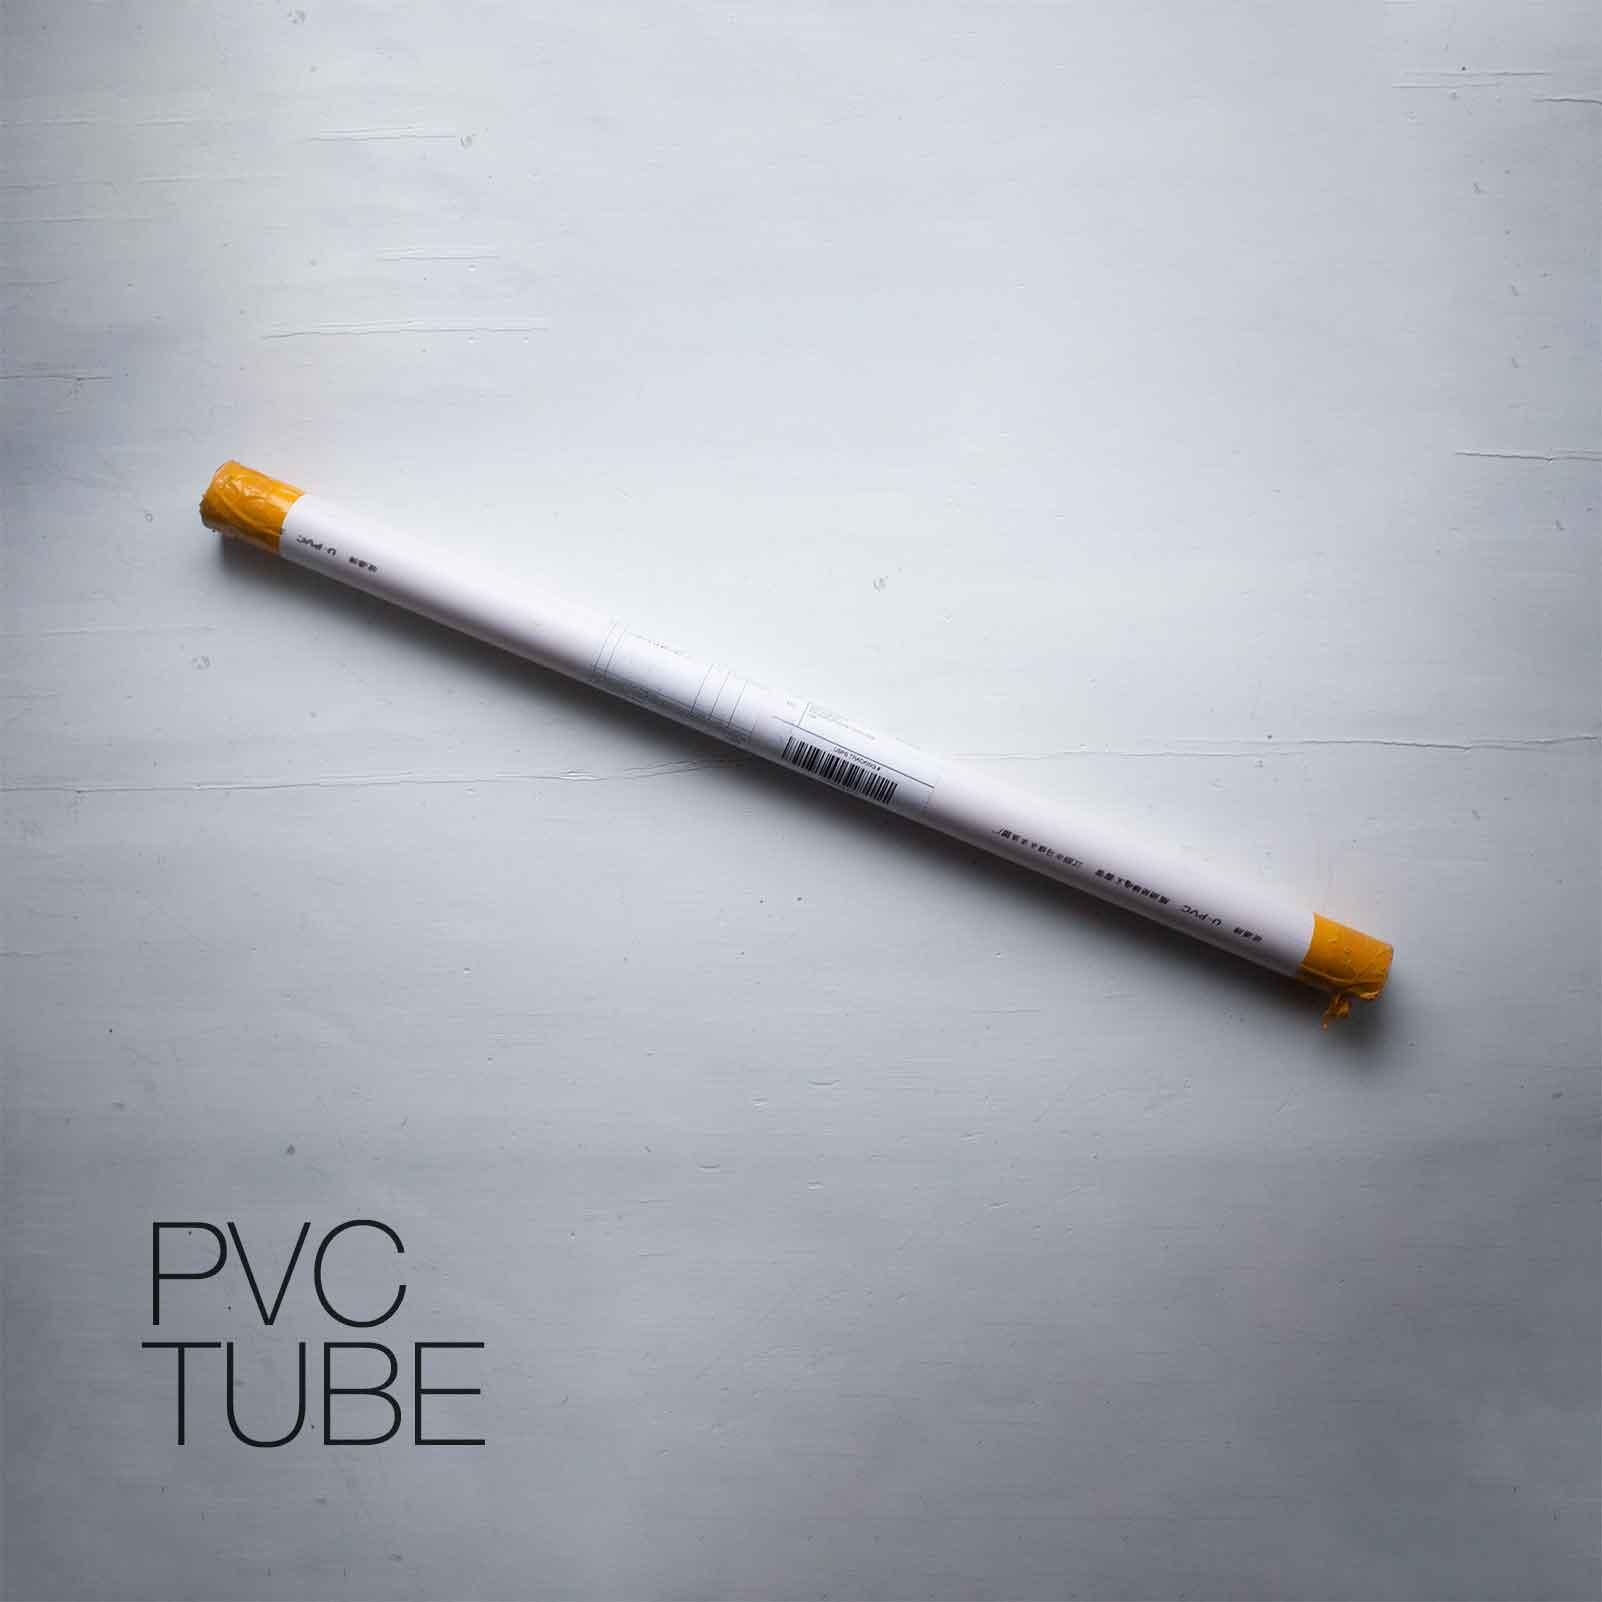 PVC Tube [Kontakt] - FREE - decent|SAMPLES